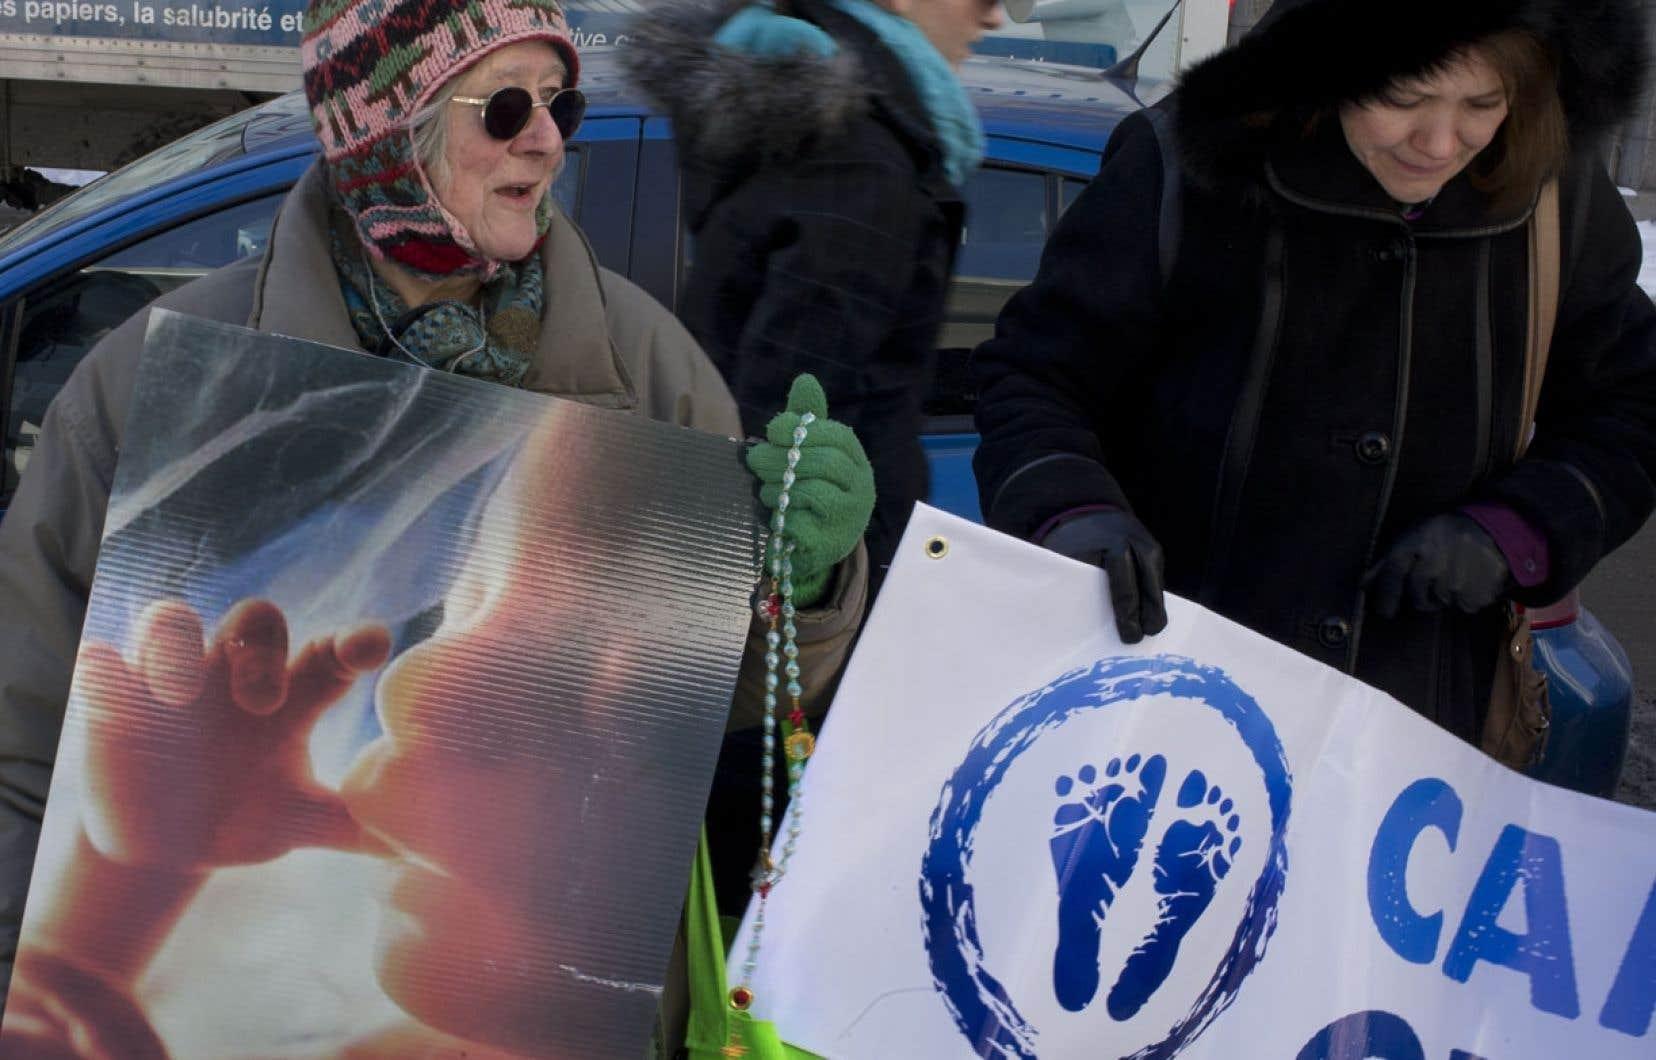 Une manifestation pro-vie s'est tenue lundi.